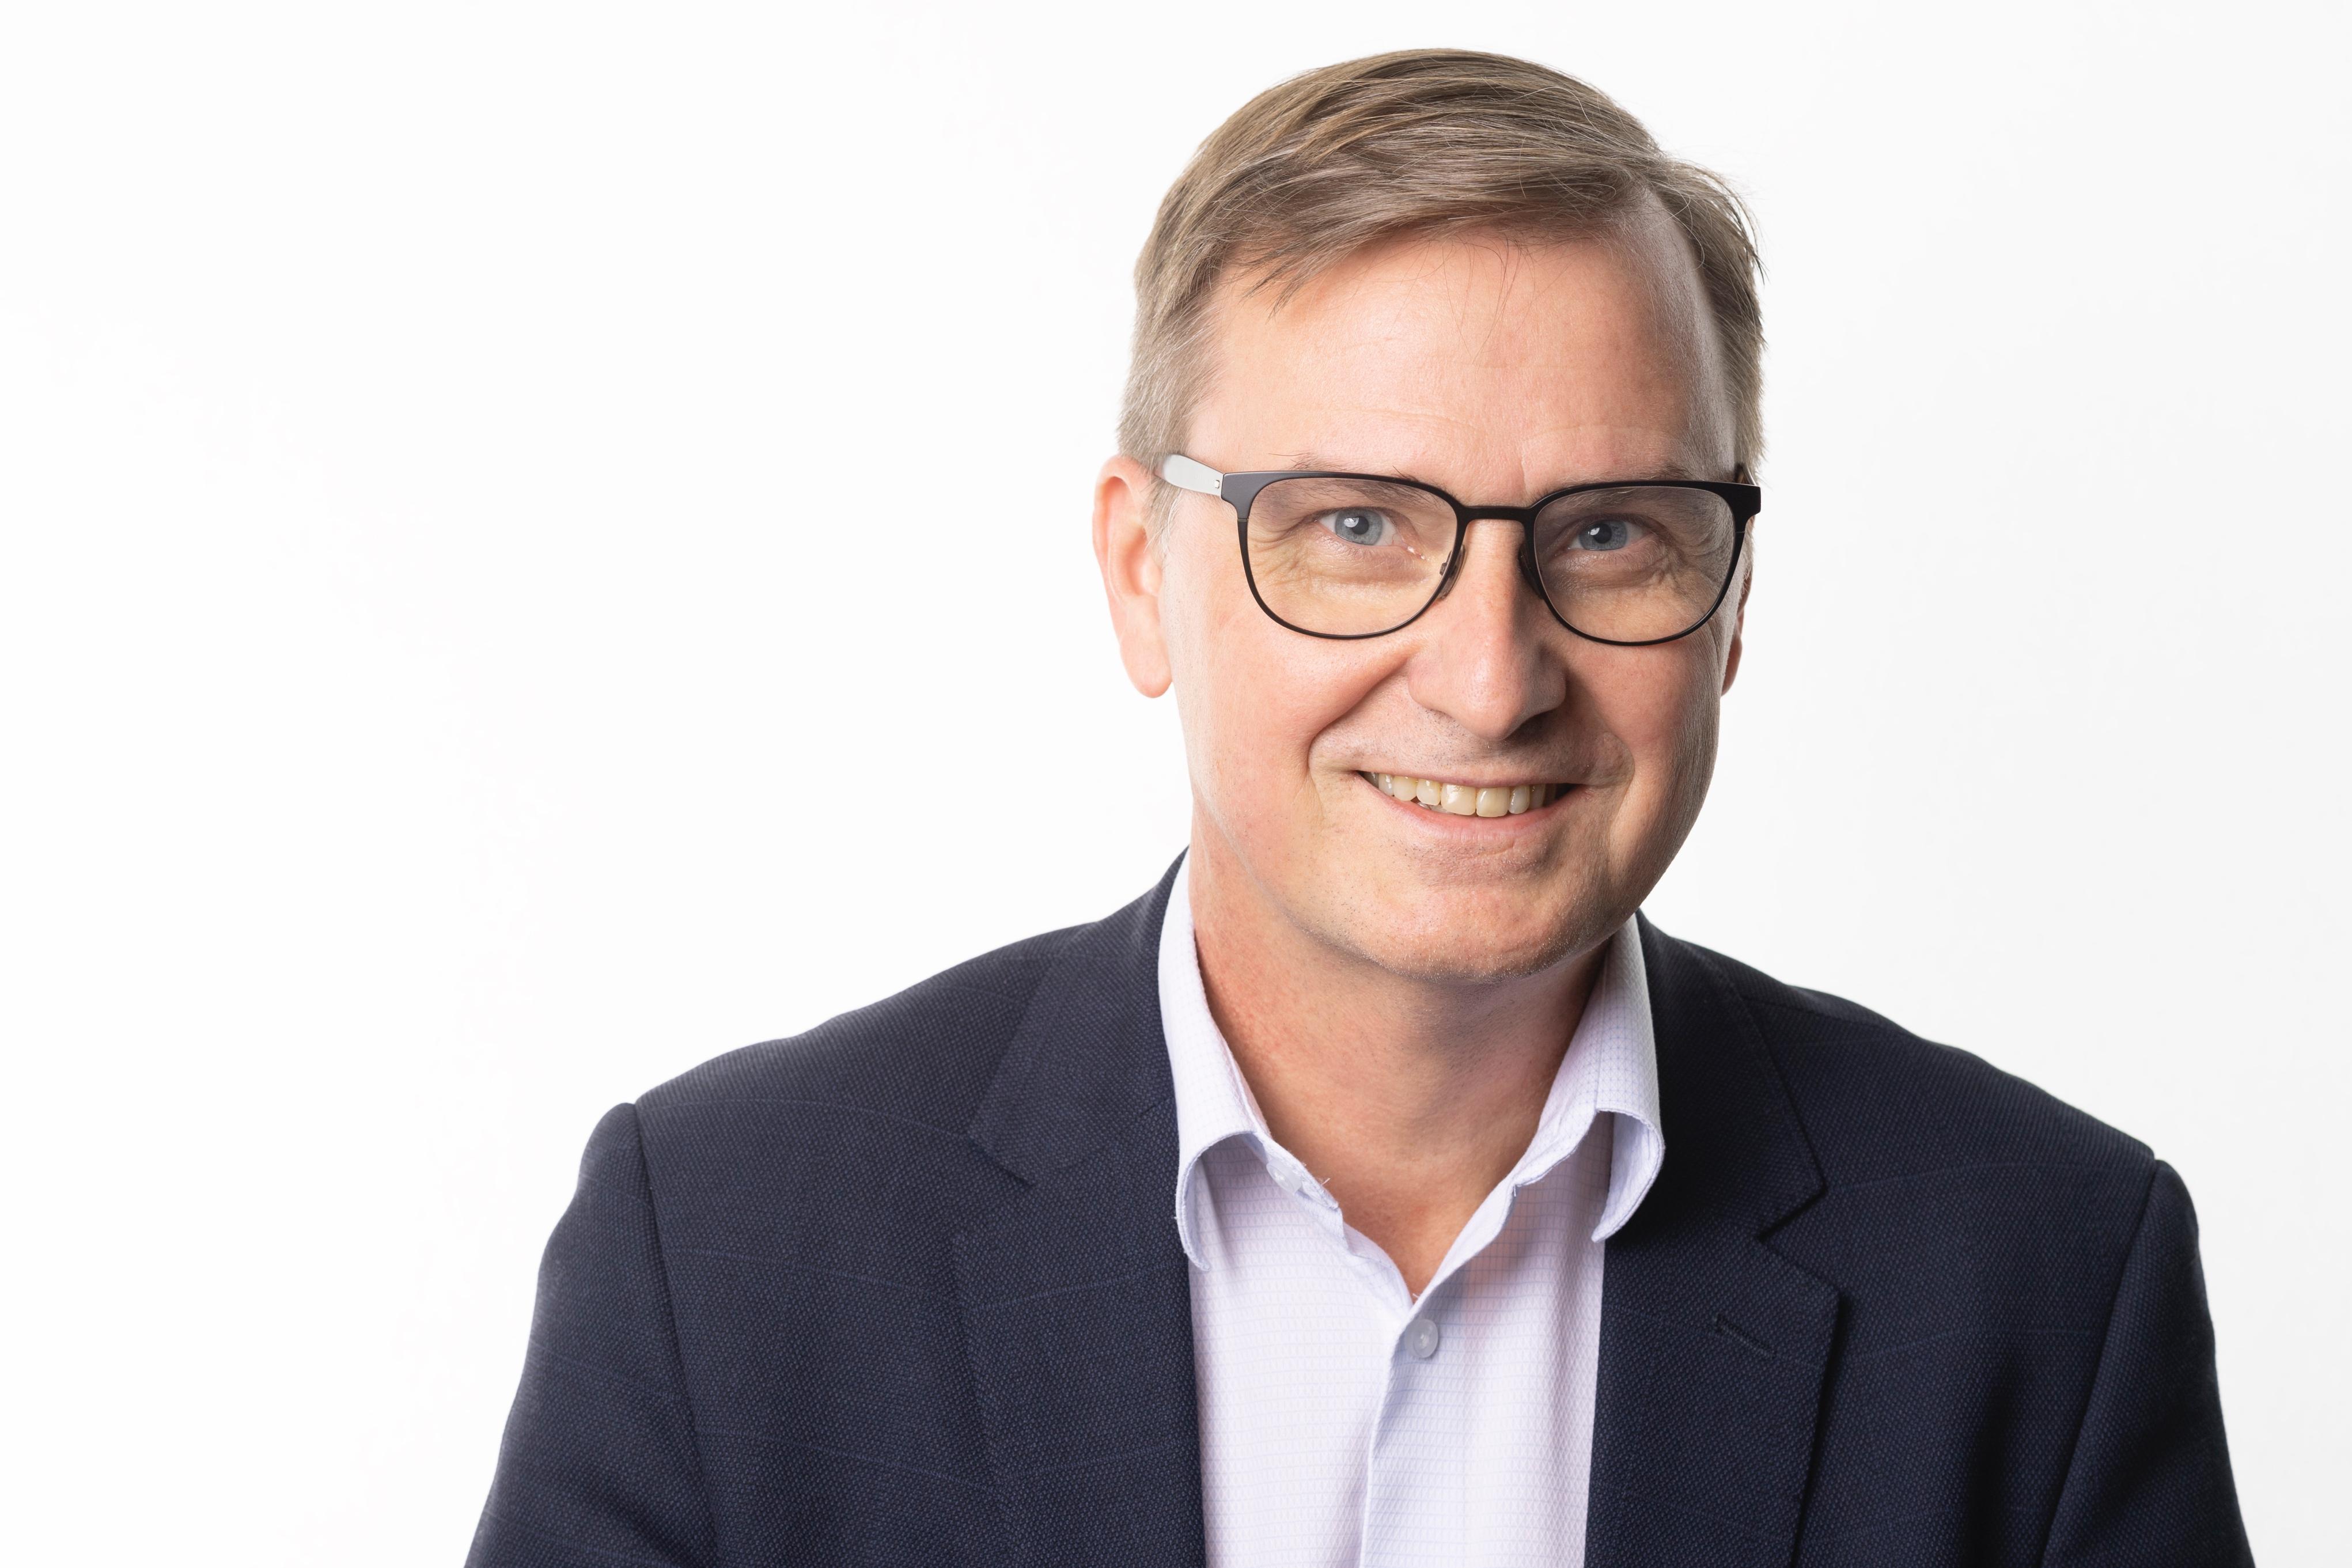 Ole Morten Boldevin